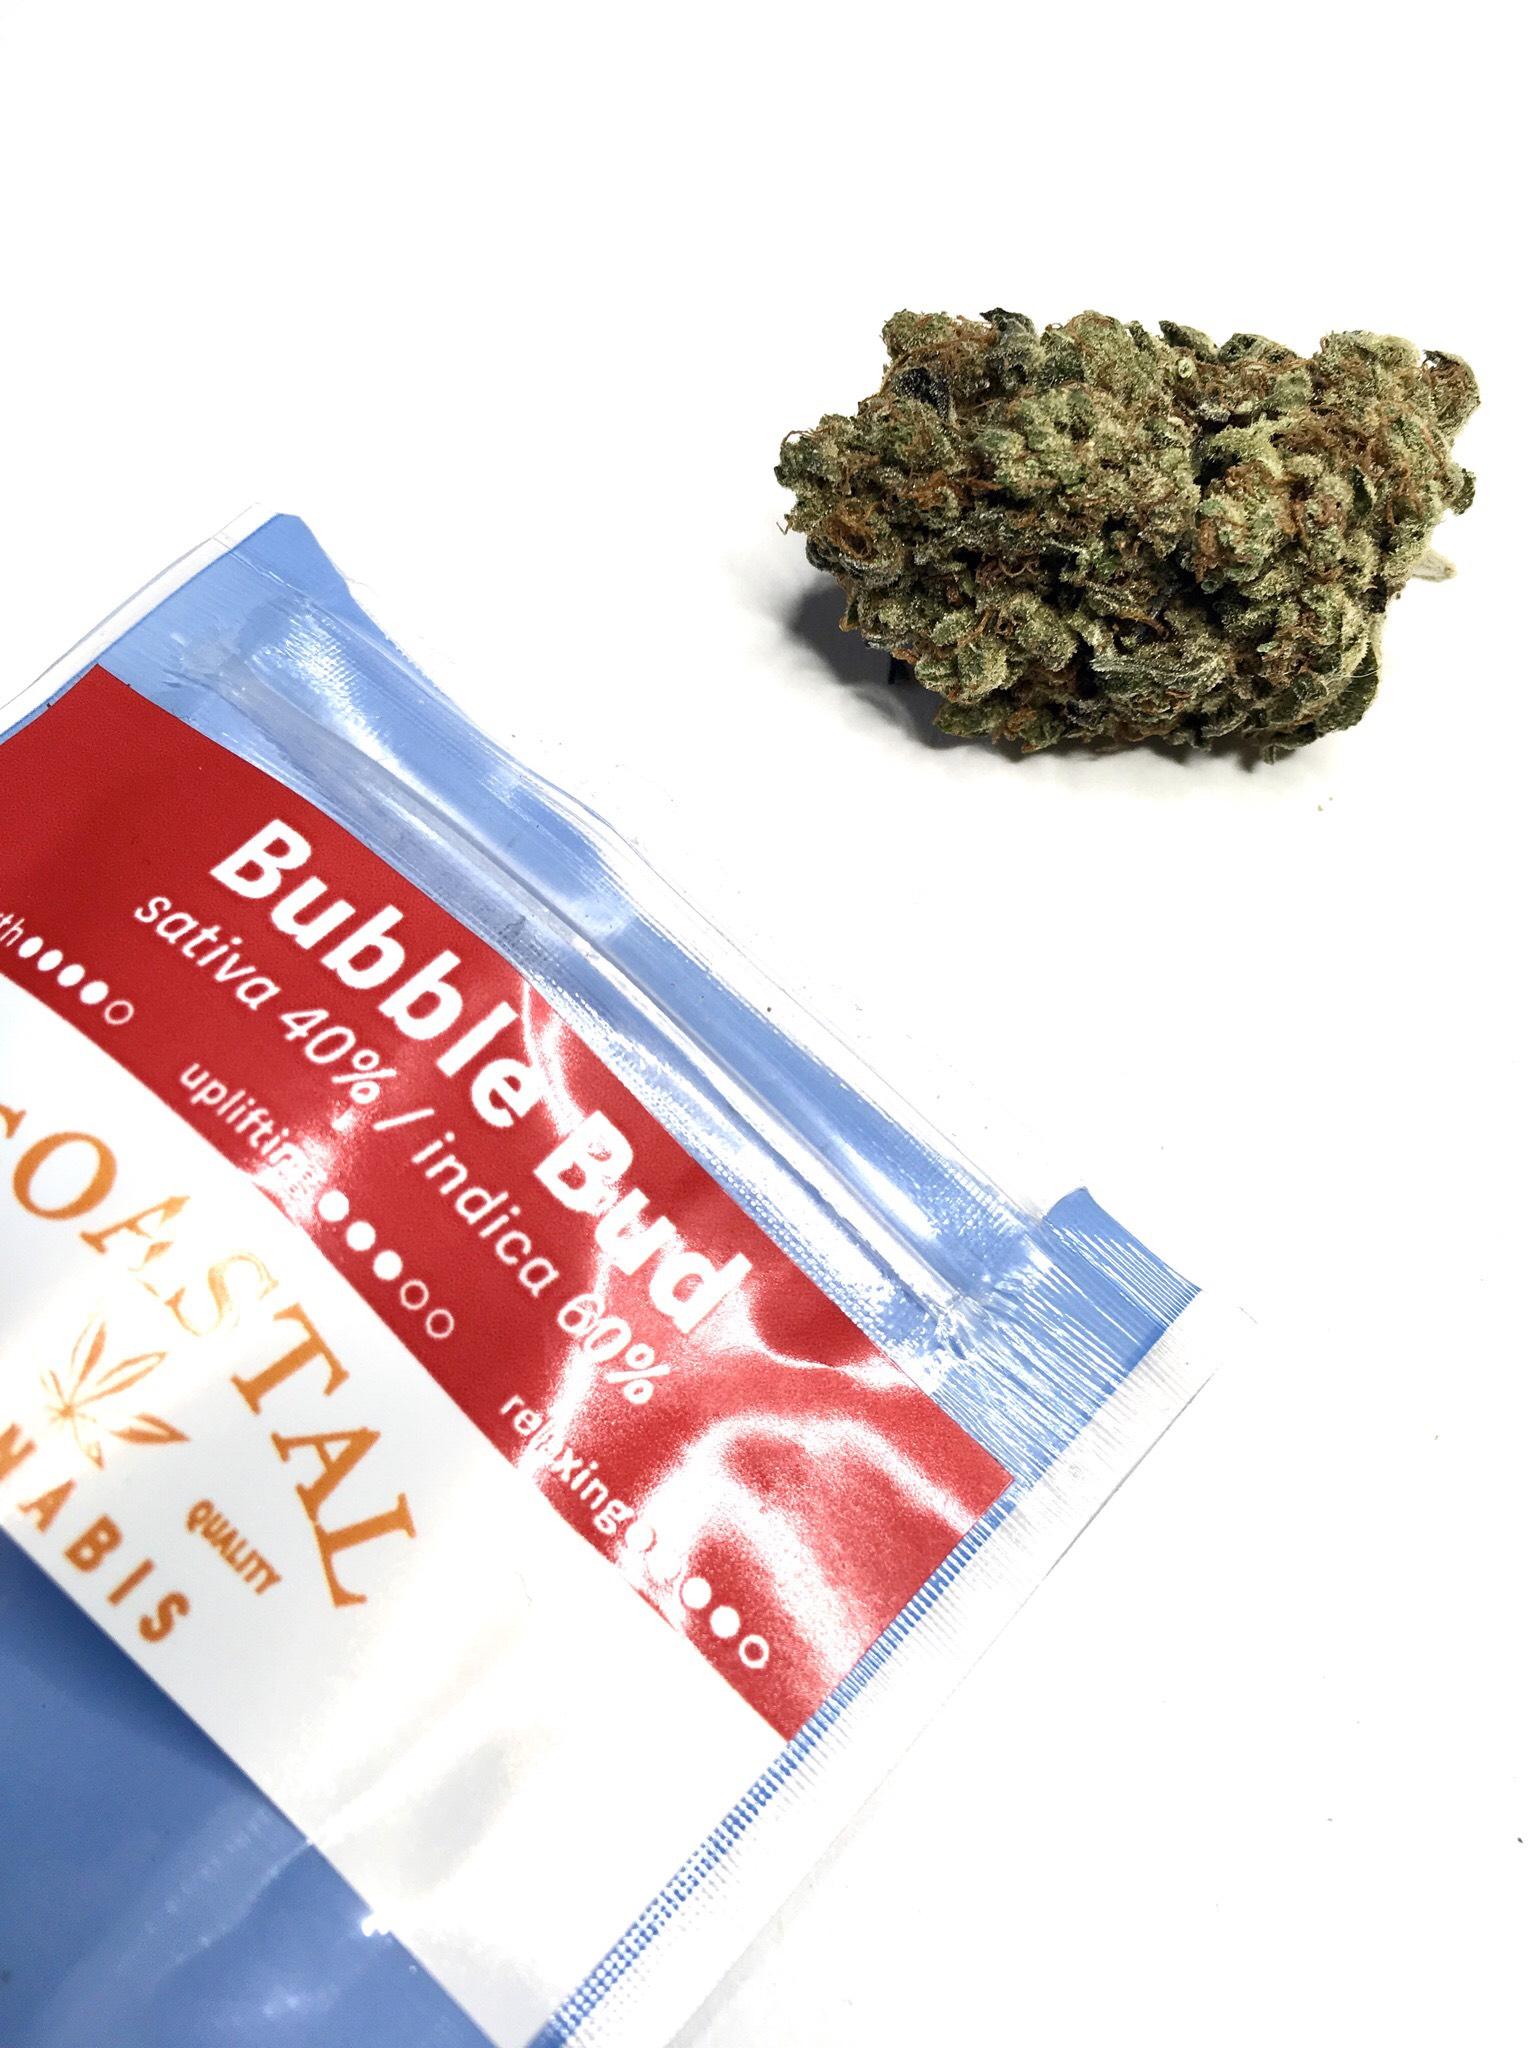 Bubble Bud Coastal Cannabis Ganja Goddess Seattle